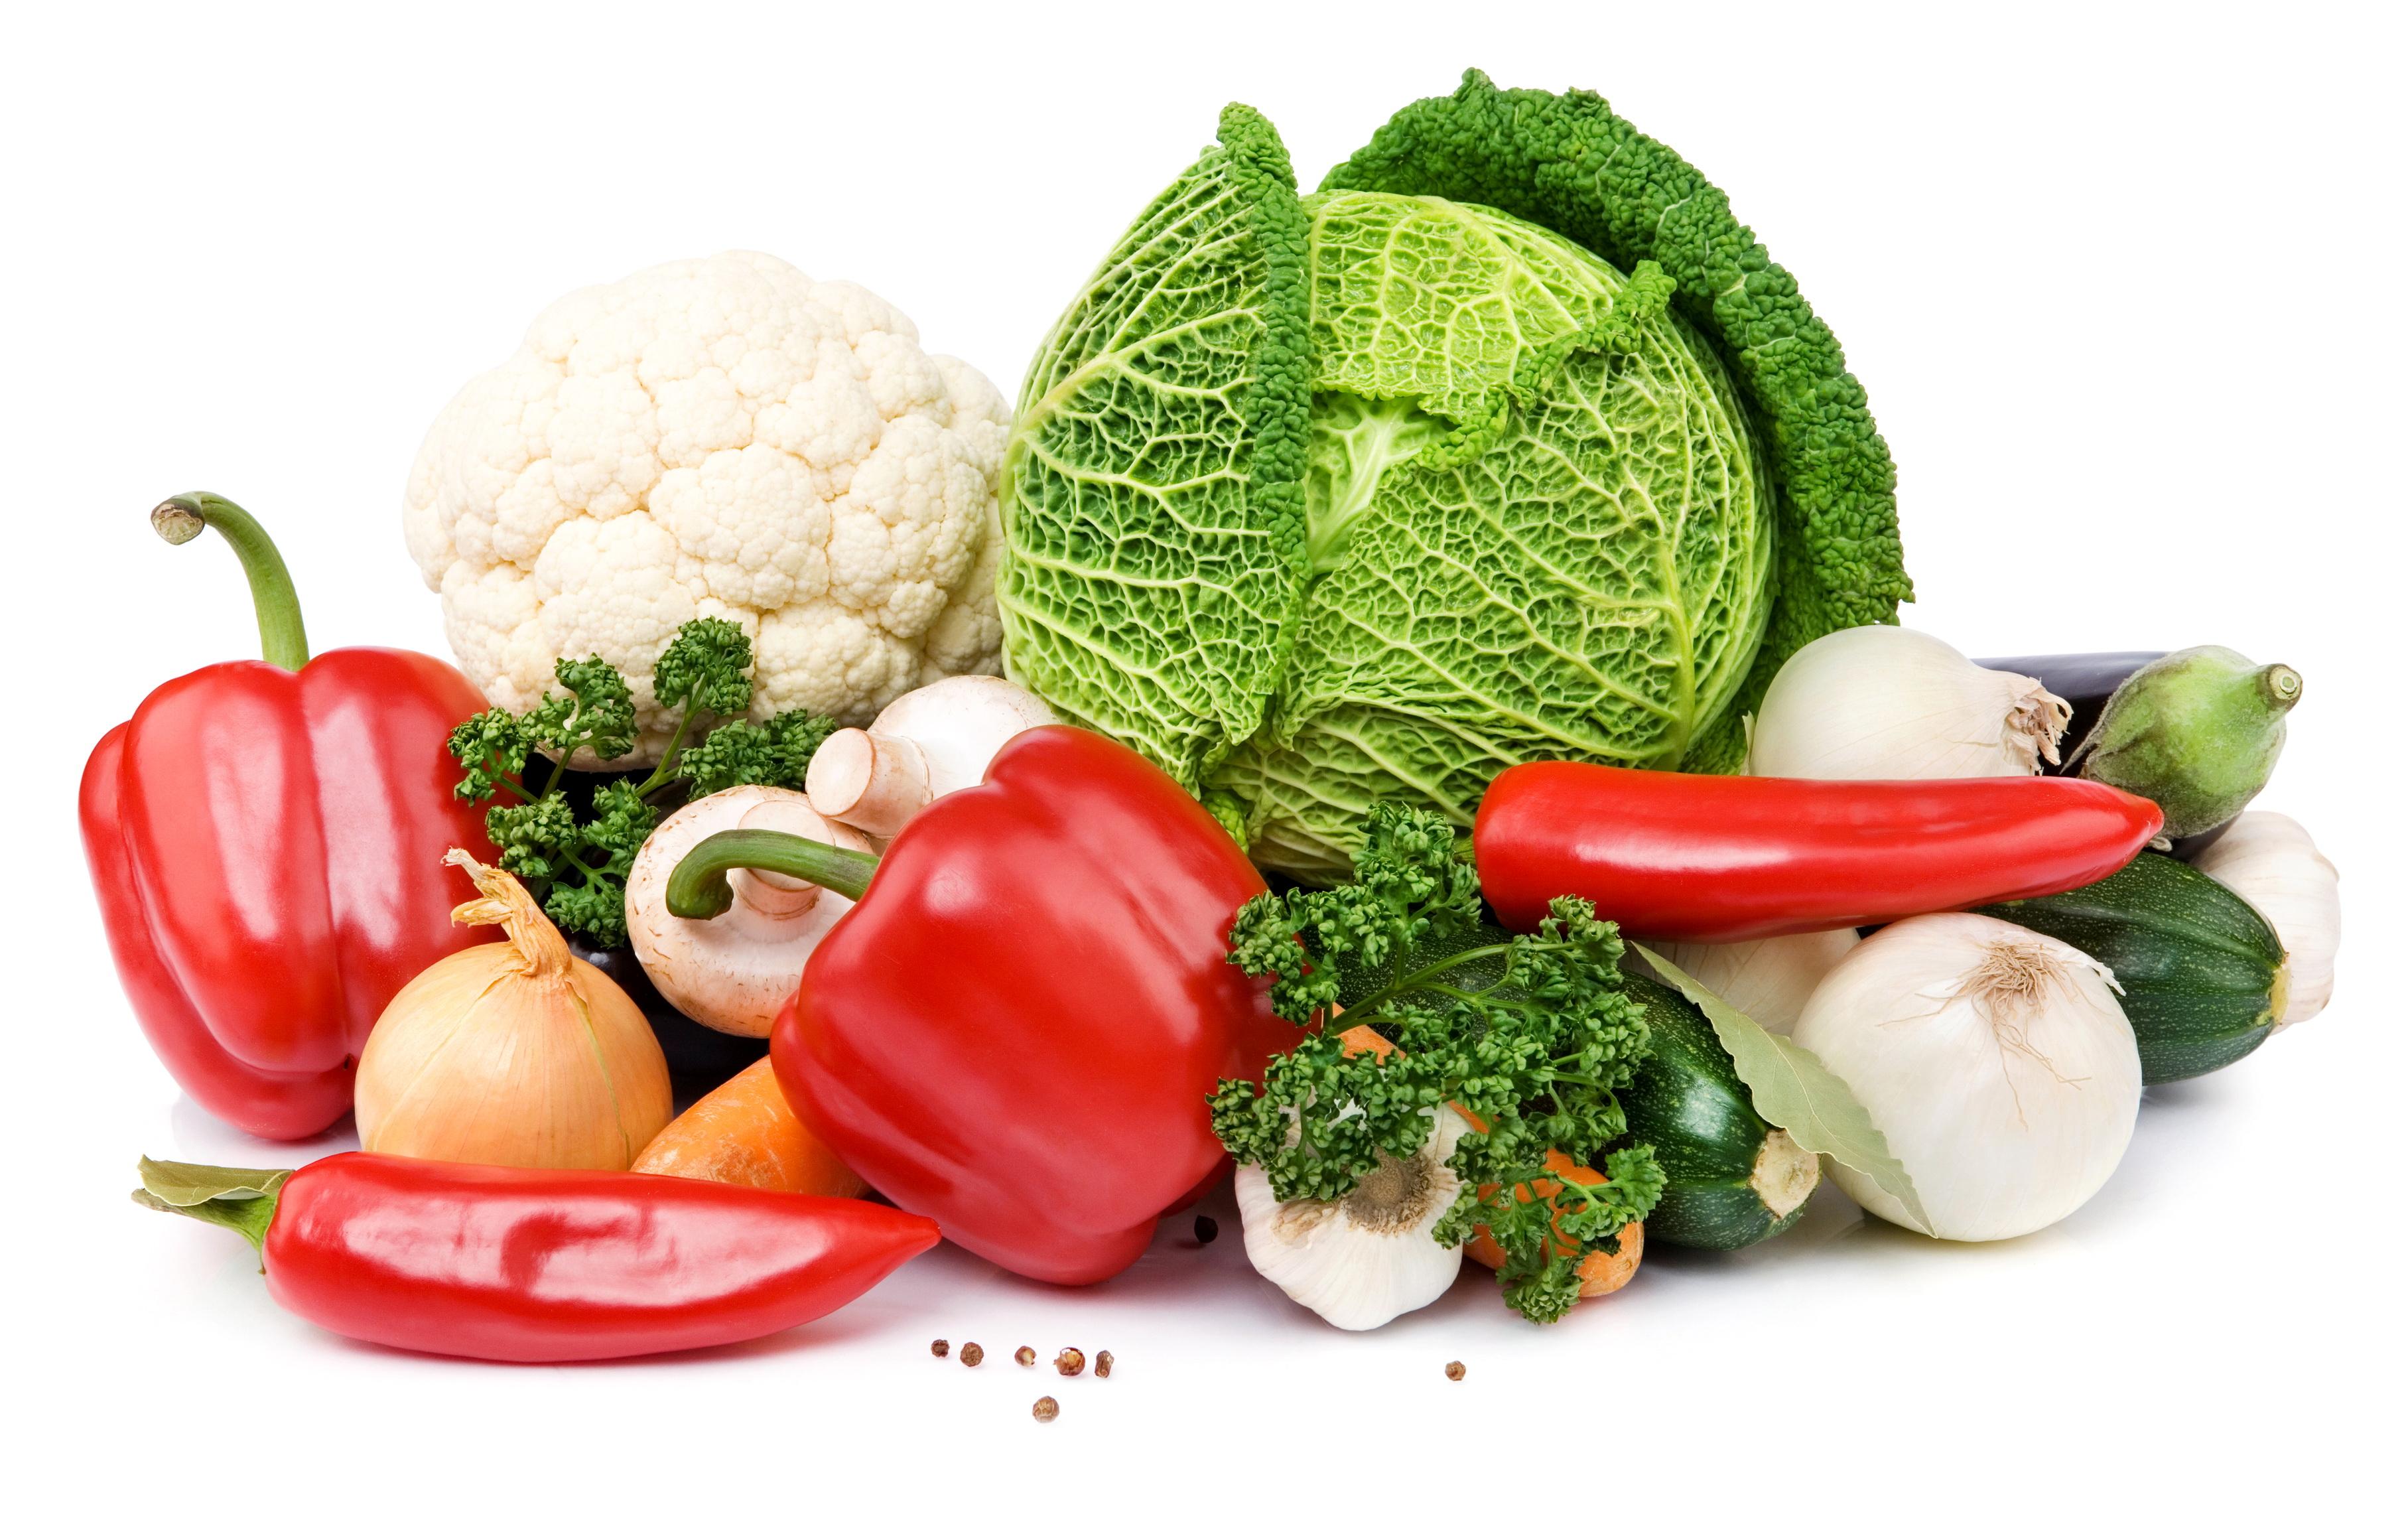 200 Vegetables HD Wallpapers | Backgrounds - Wallpaper